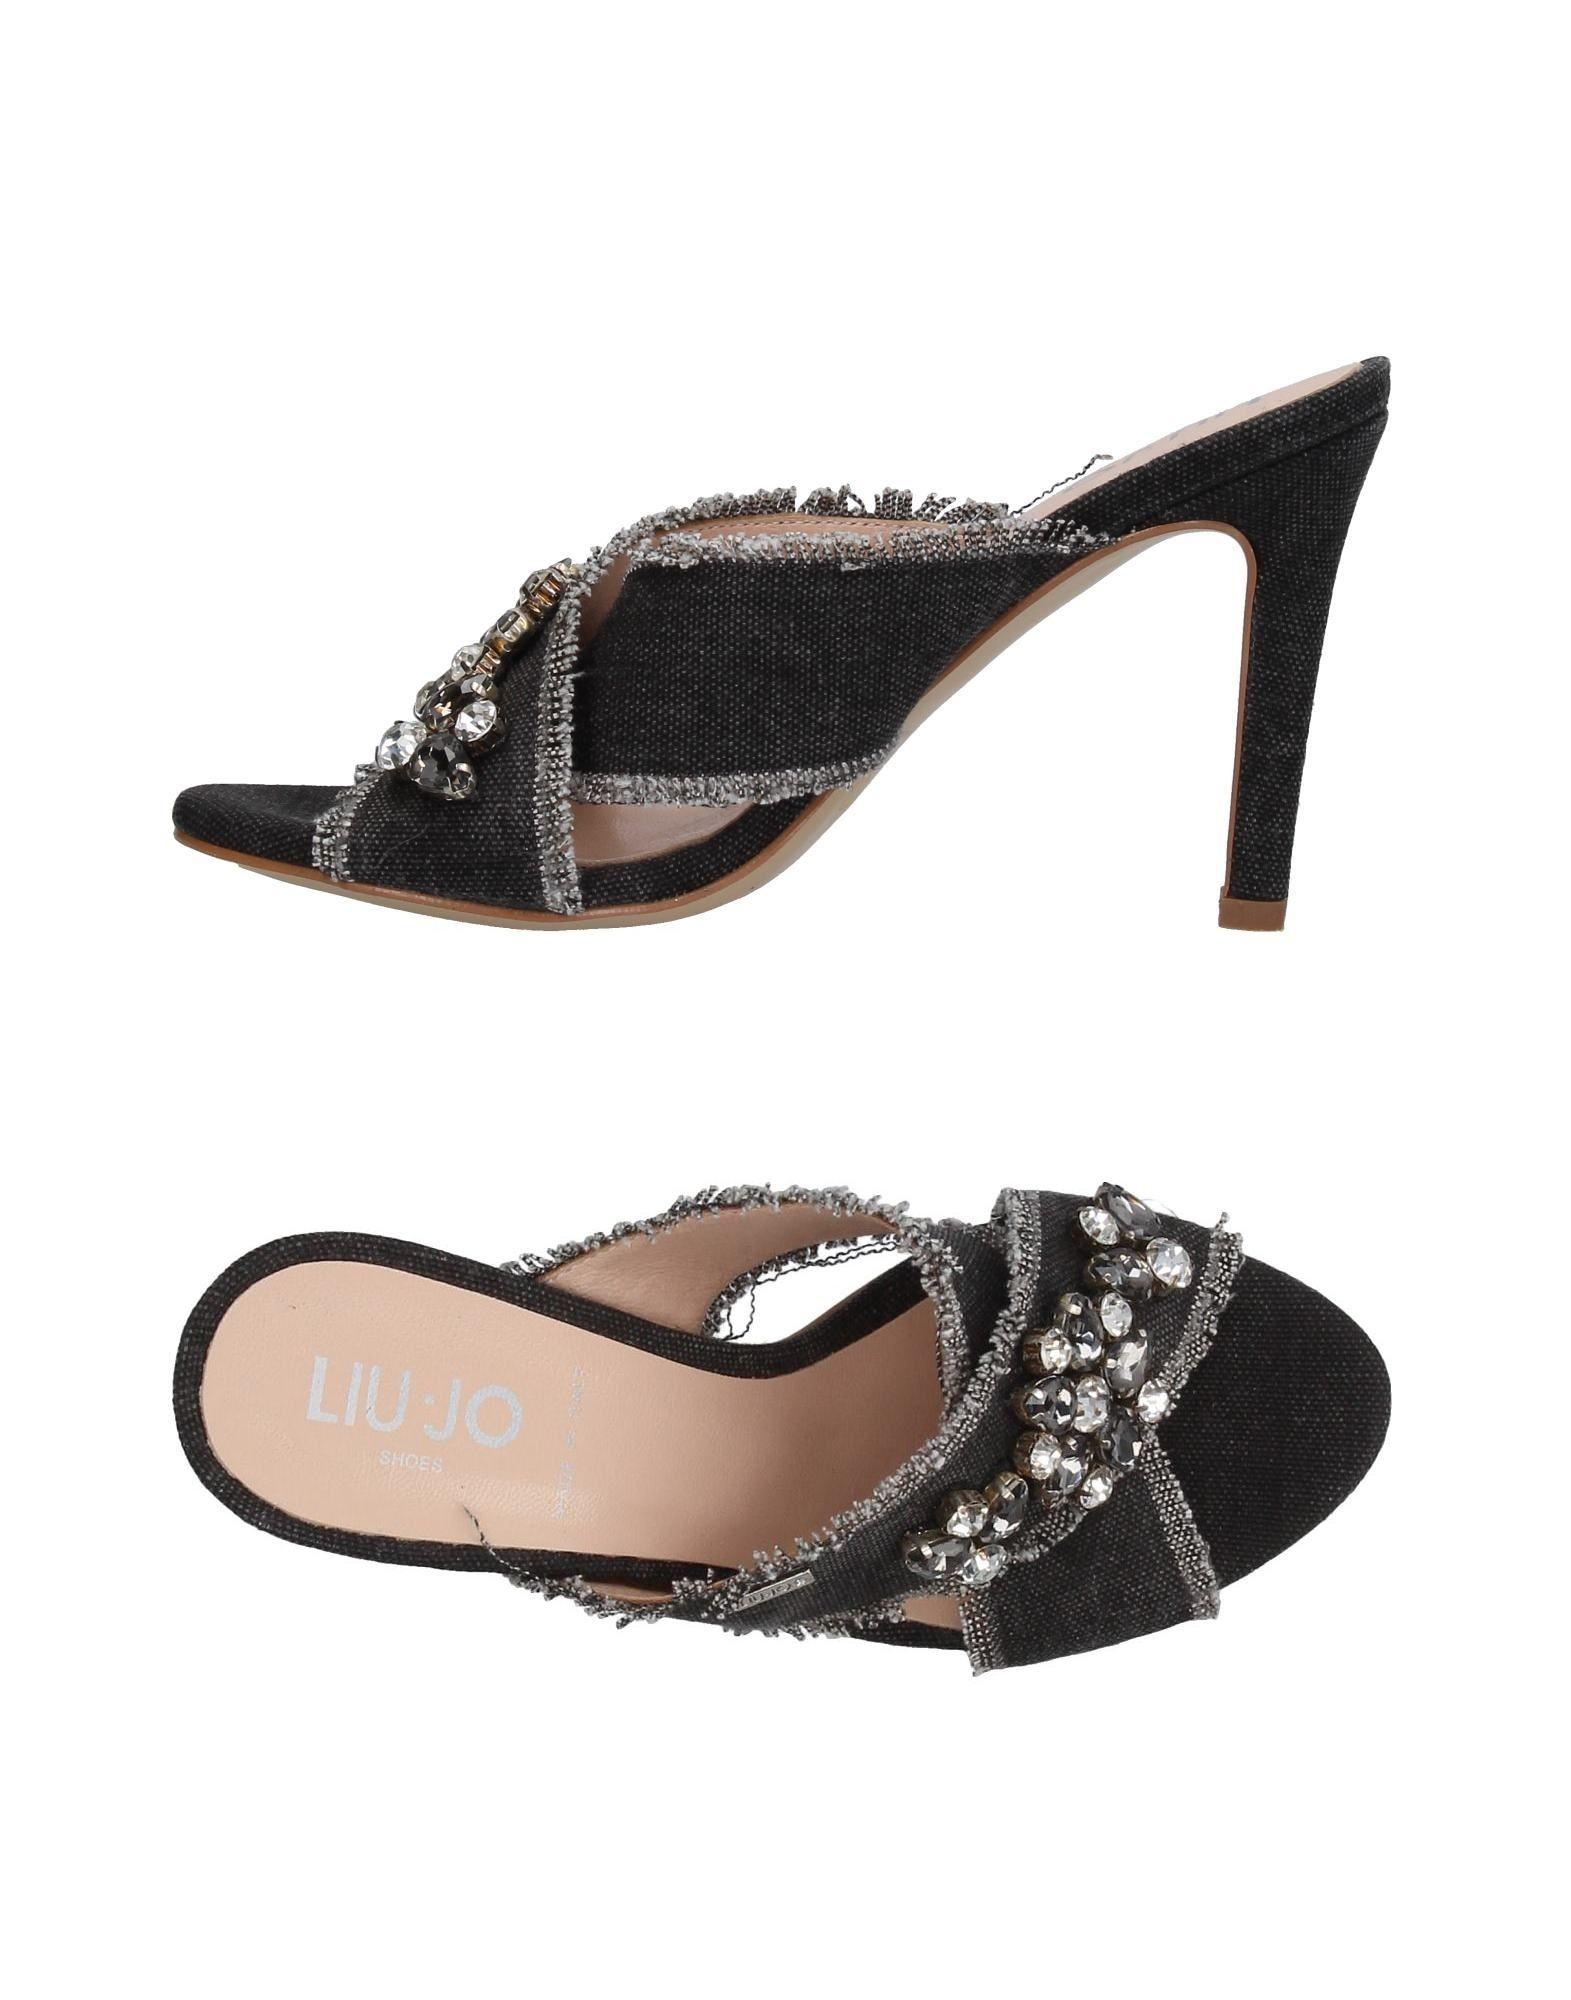 Liu •Jo Shoes Sandalen 11380430ND Damen  11380430ND Sandalen  6ba816